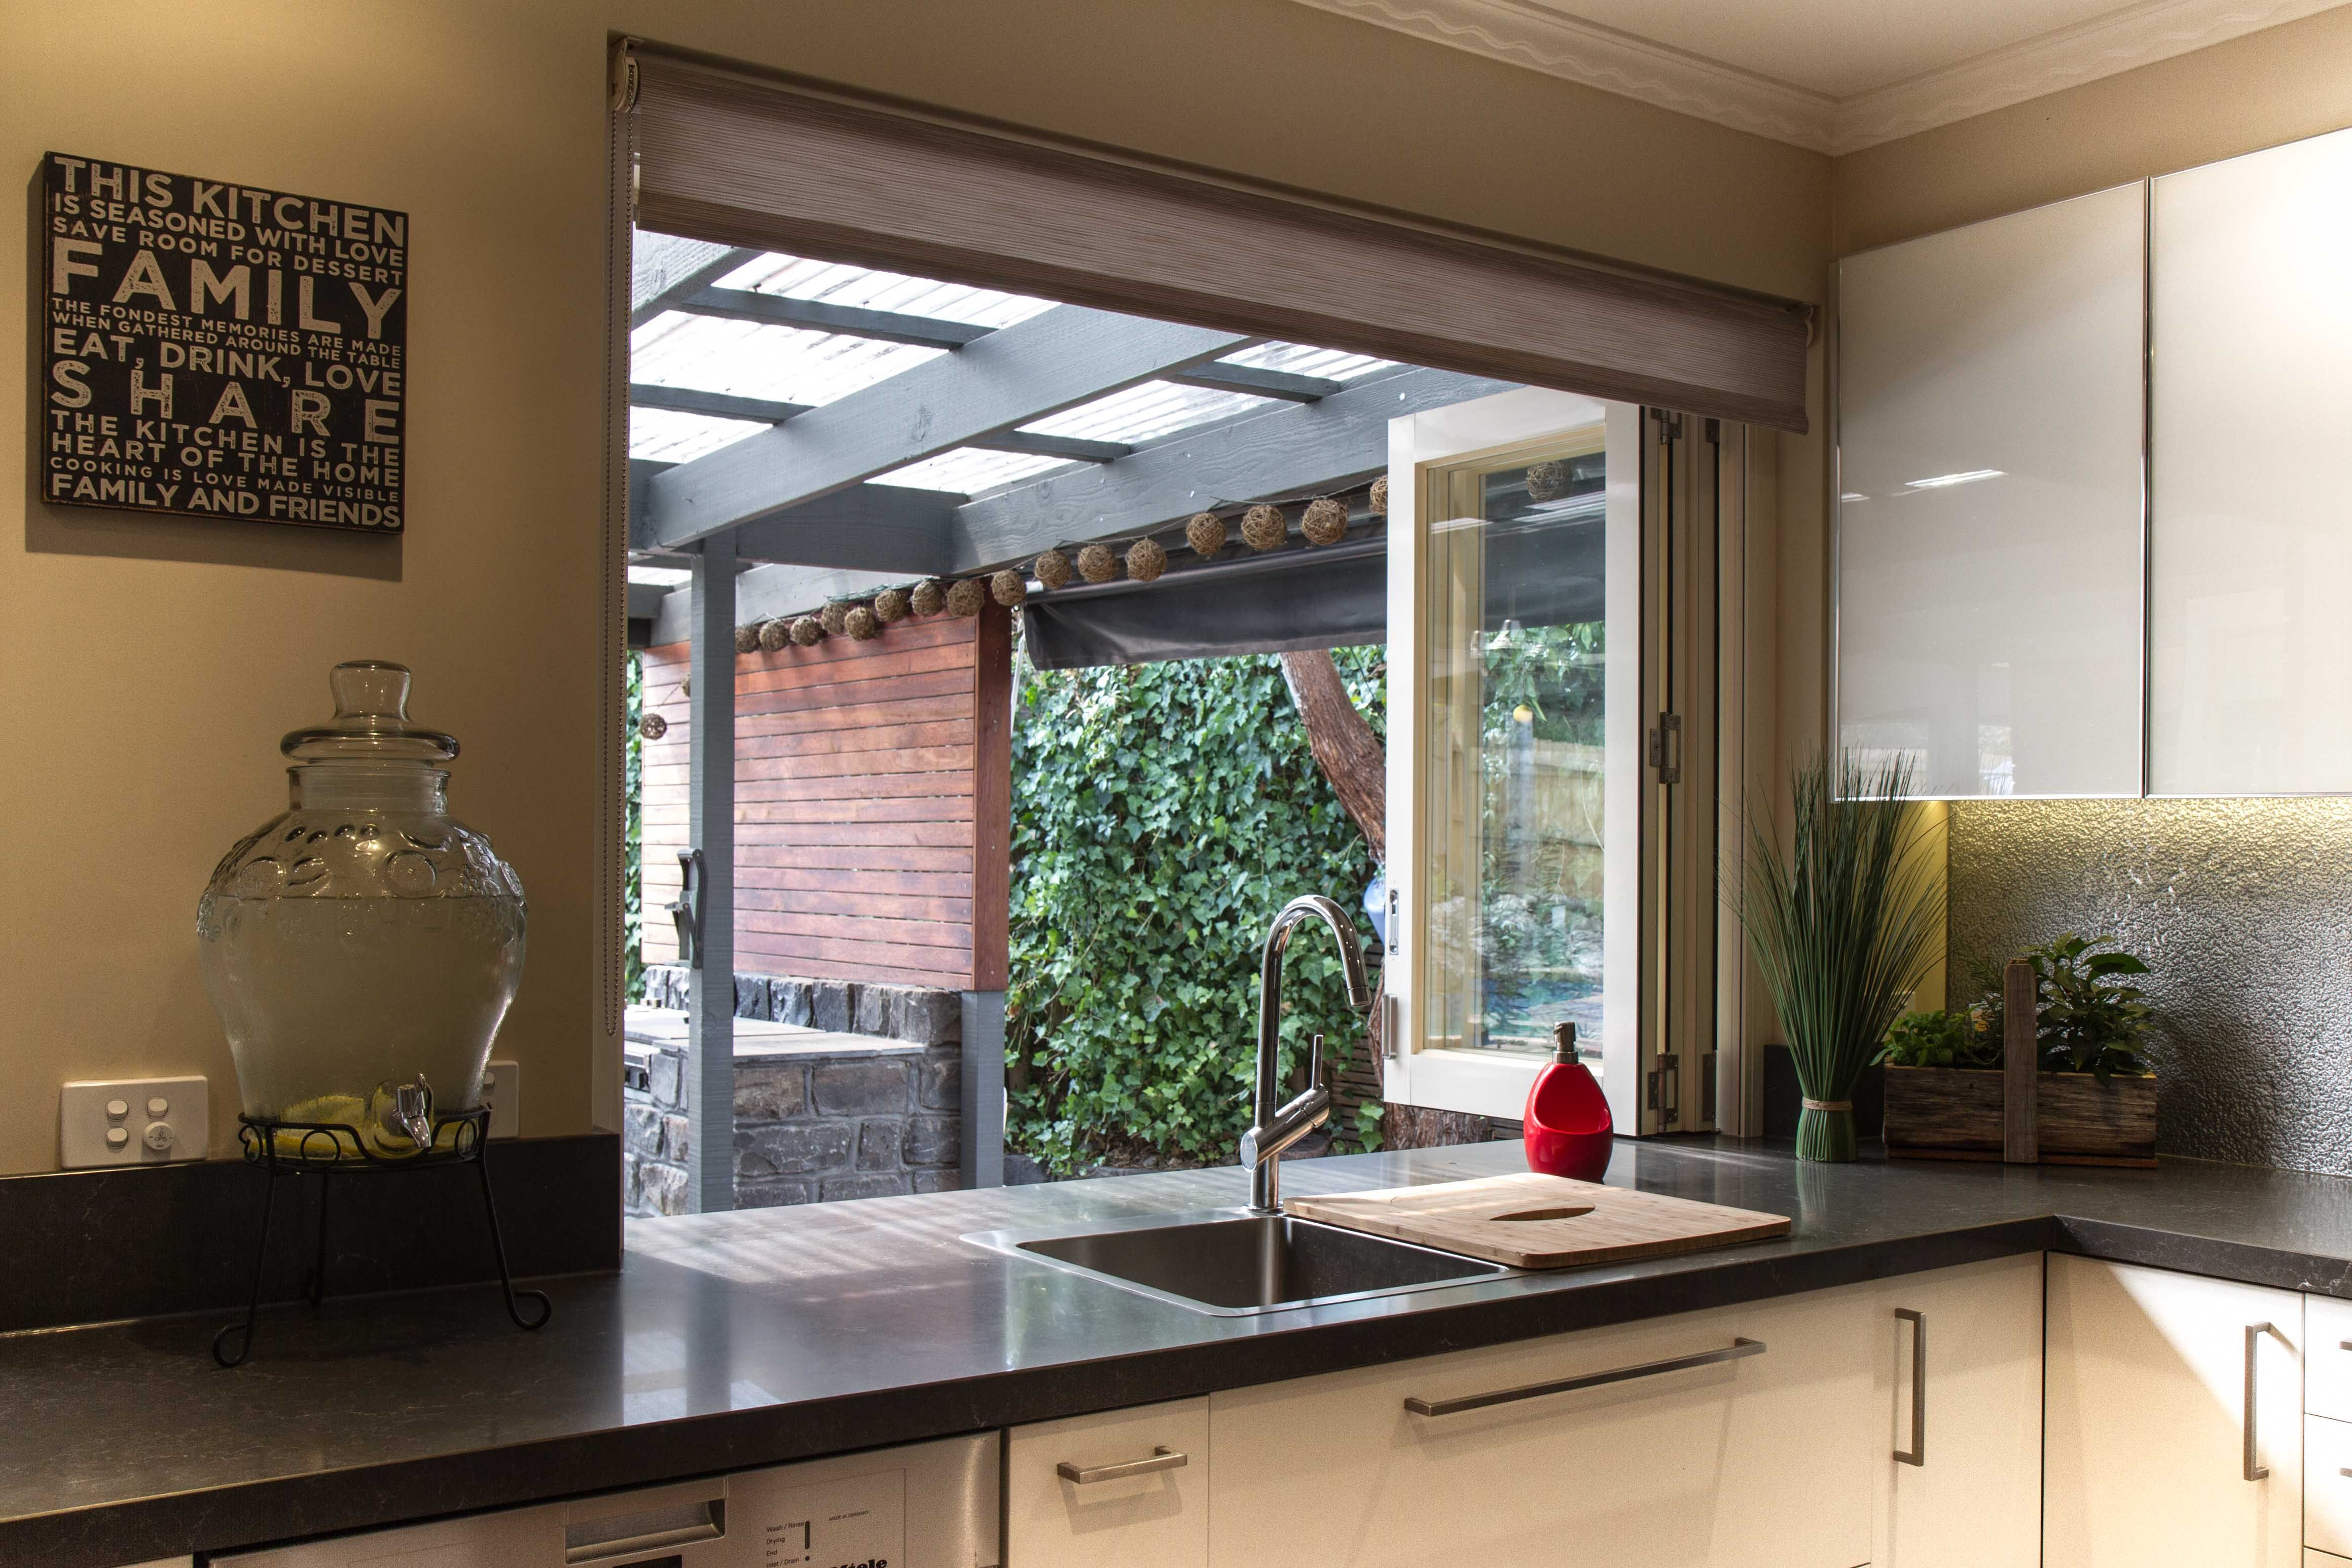 Modern Kitchen Servery Window Fold Up Windows At Sink Www Thekitchendesigncentre Au